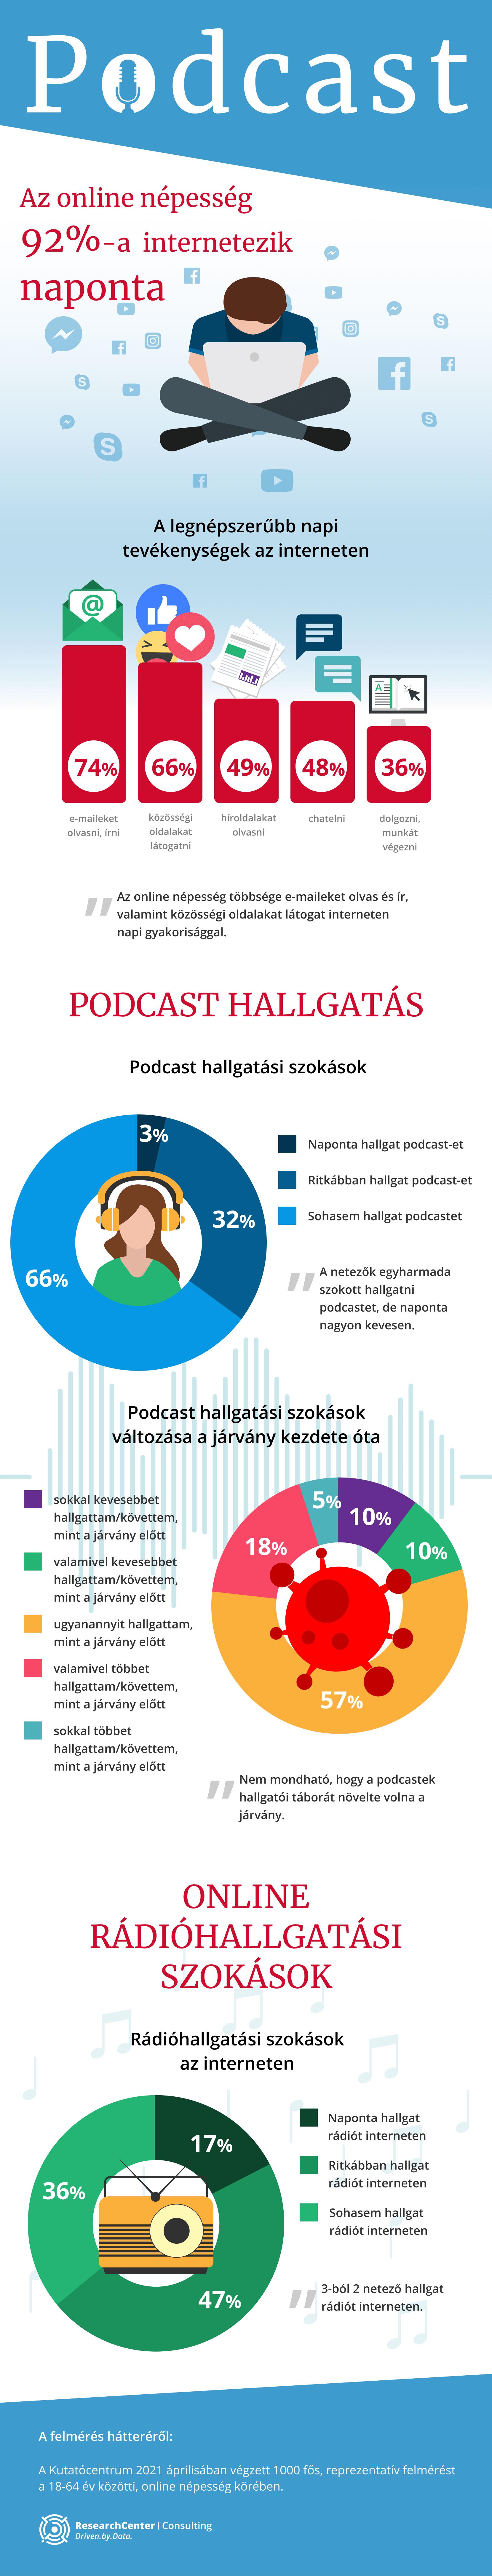 Podcast infografika